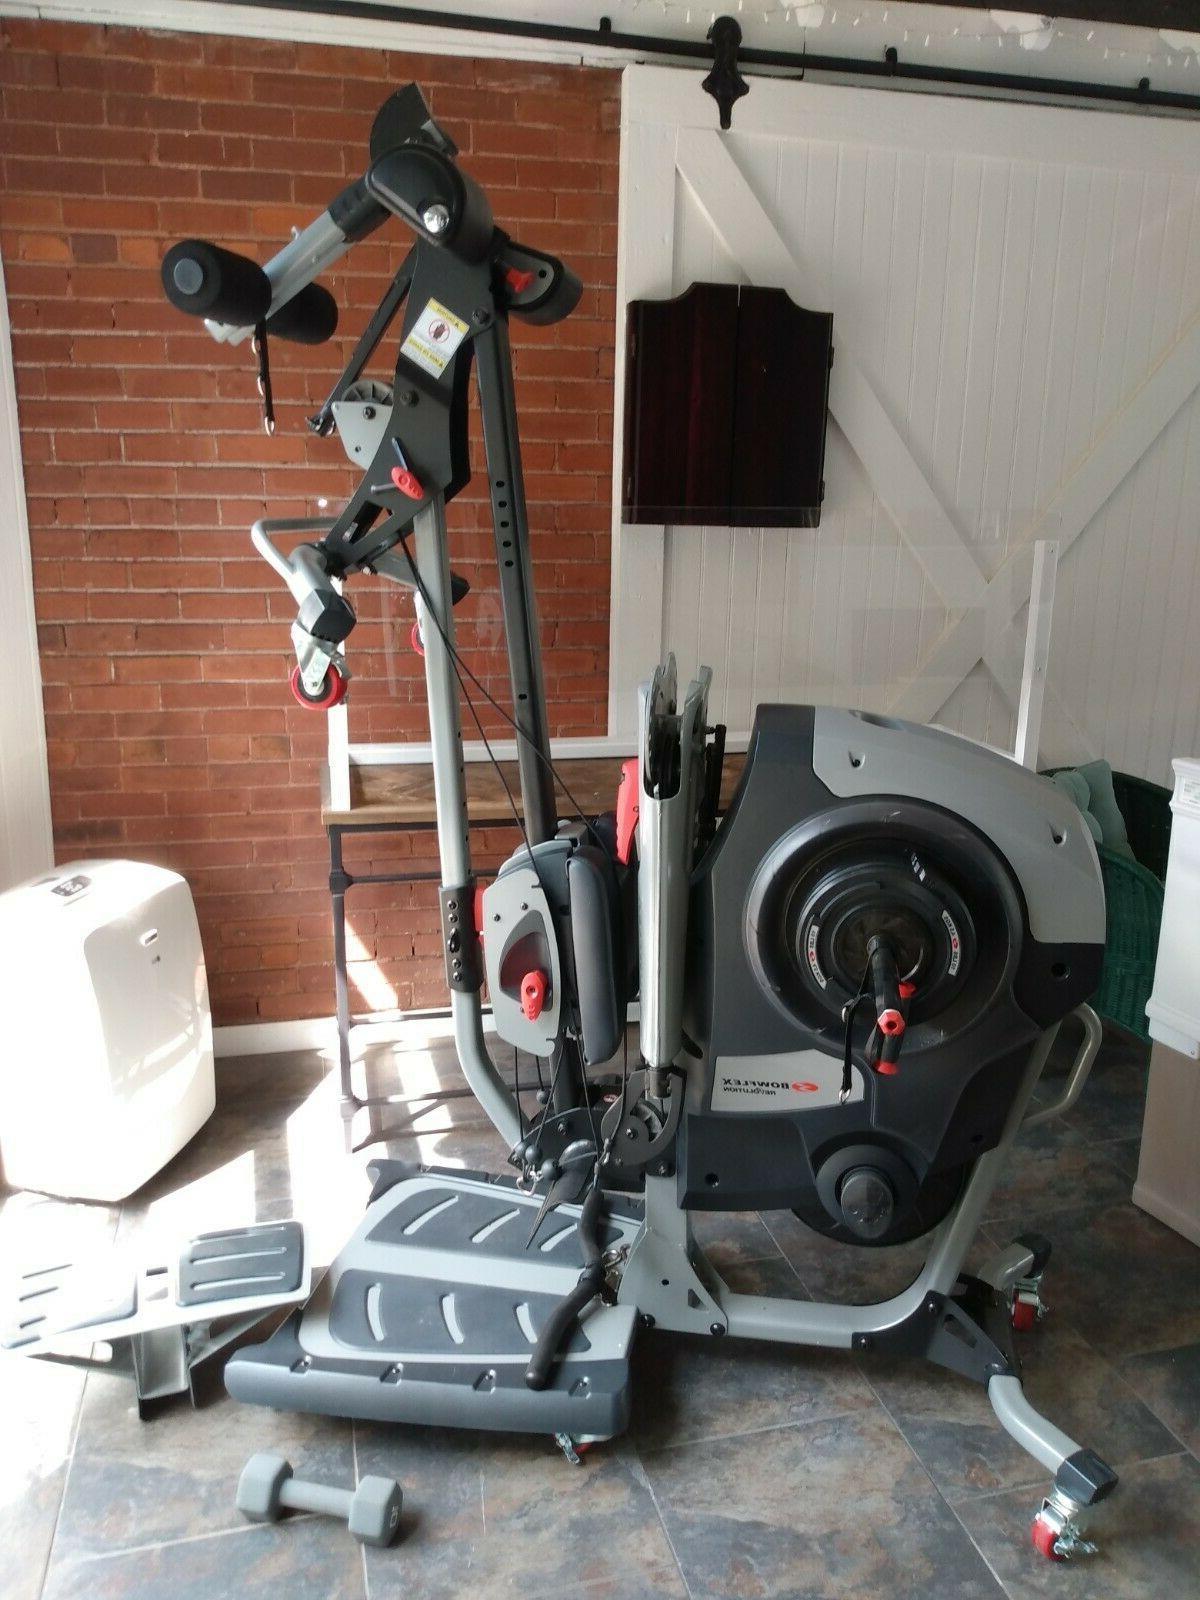 revolution home gym 2020 model w attachments